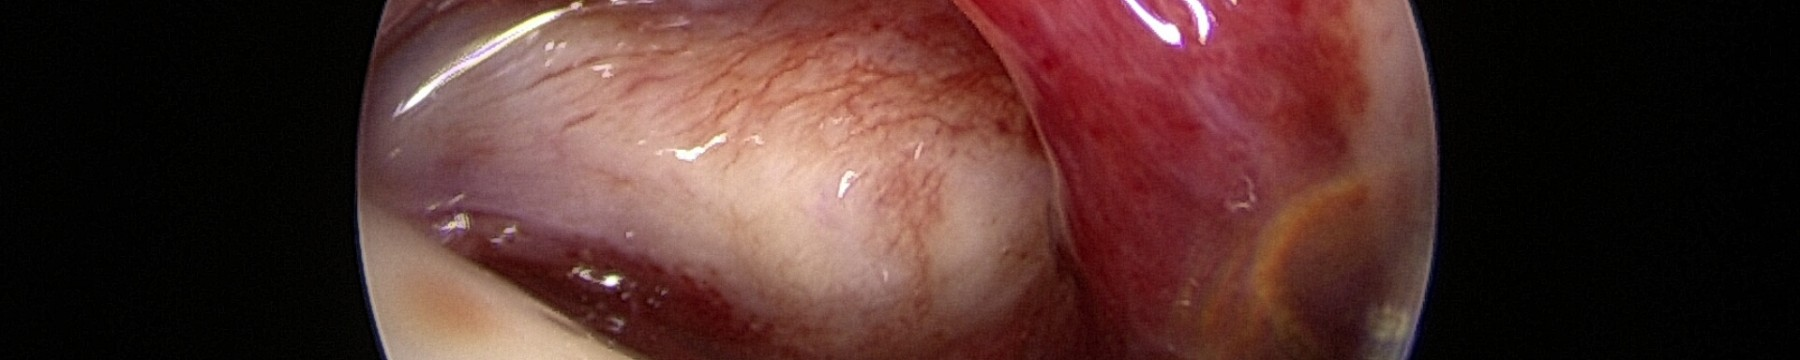 Capsulite rétractile «primaires»